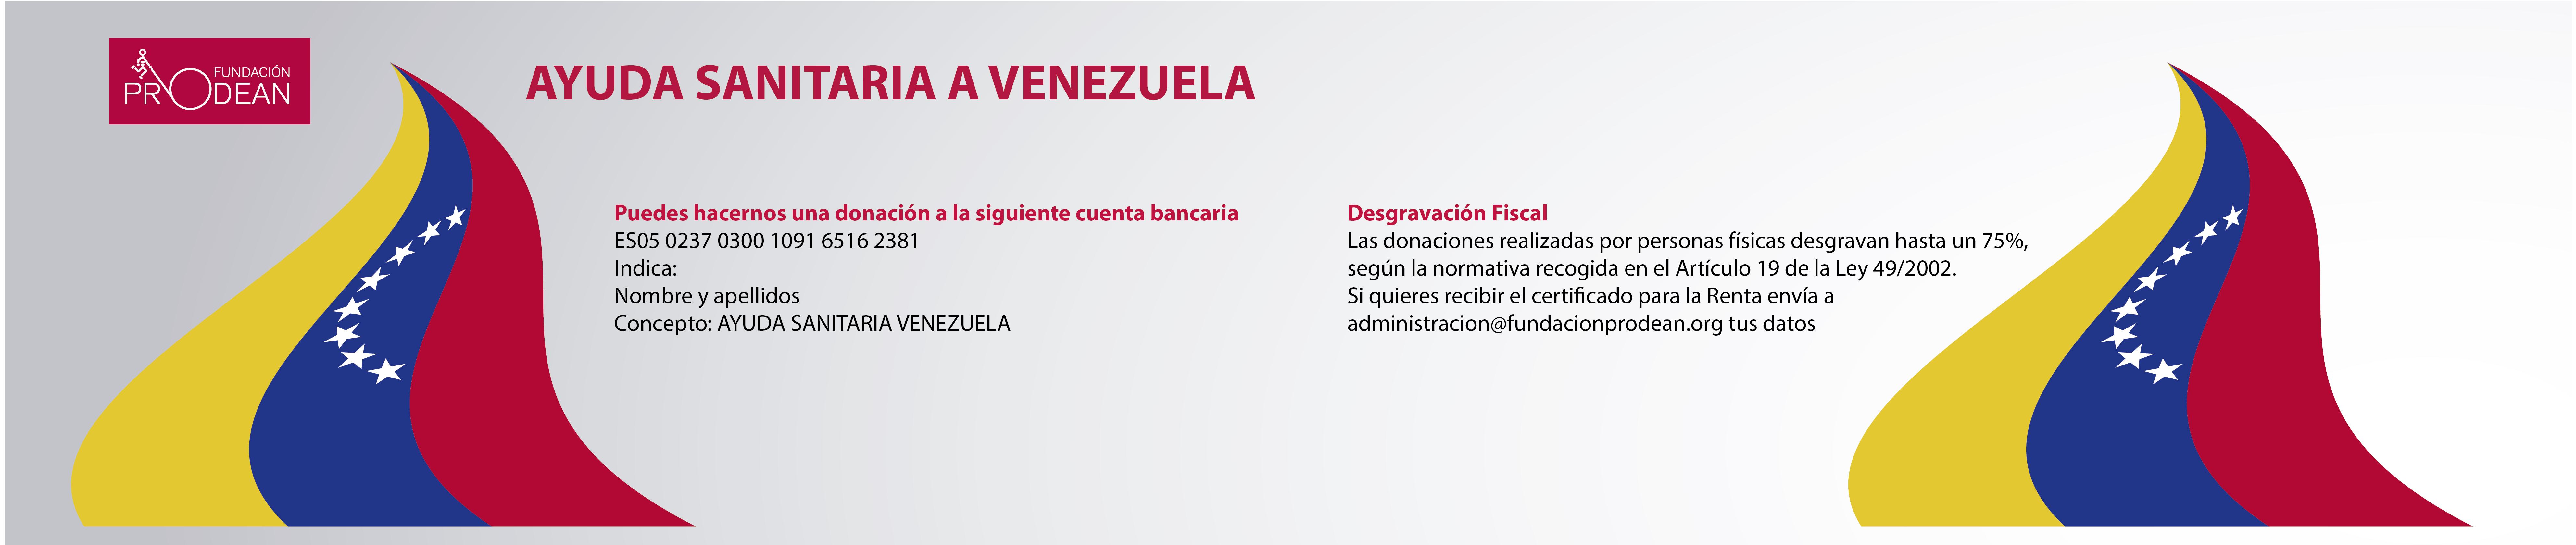 sliderVenezuela-01-01